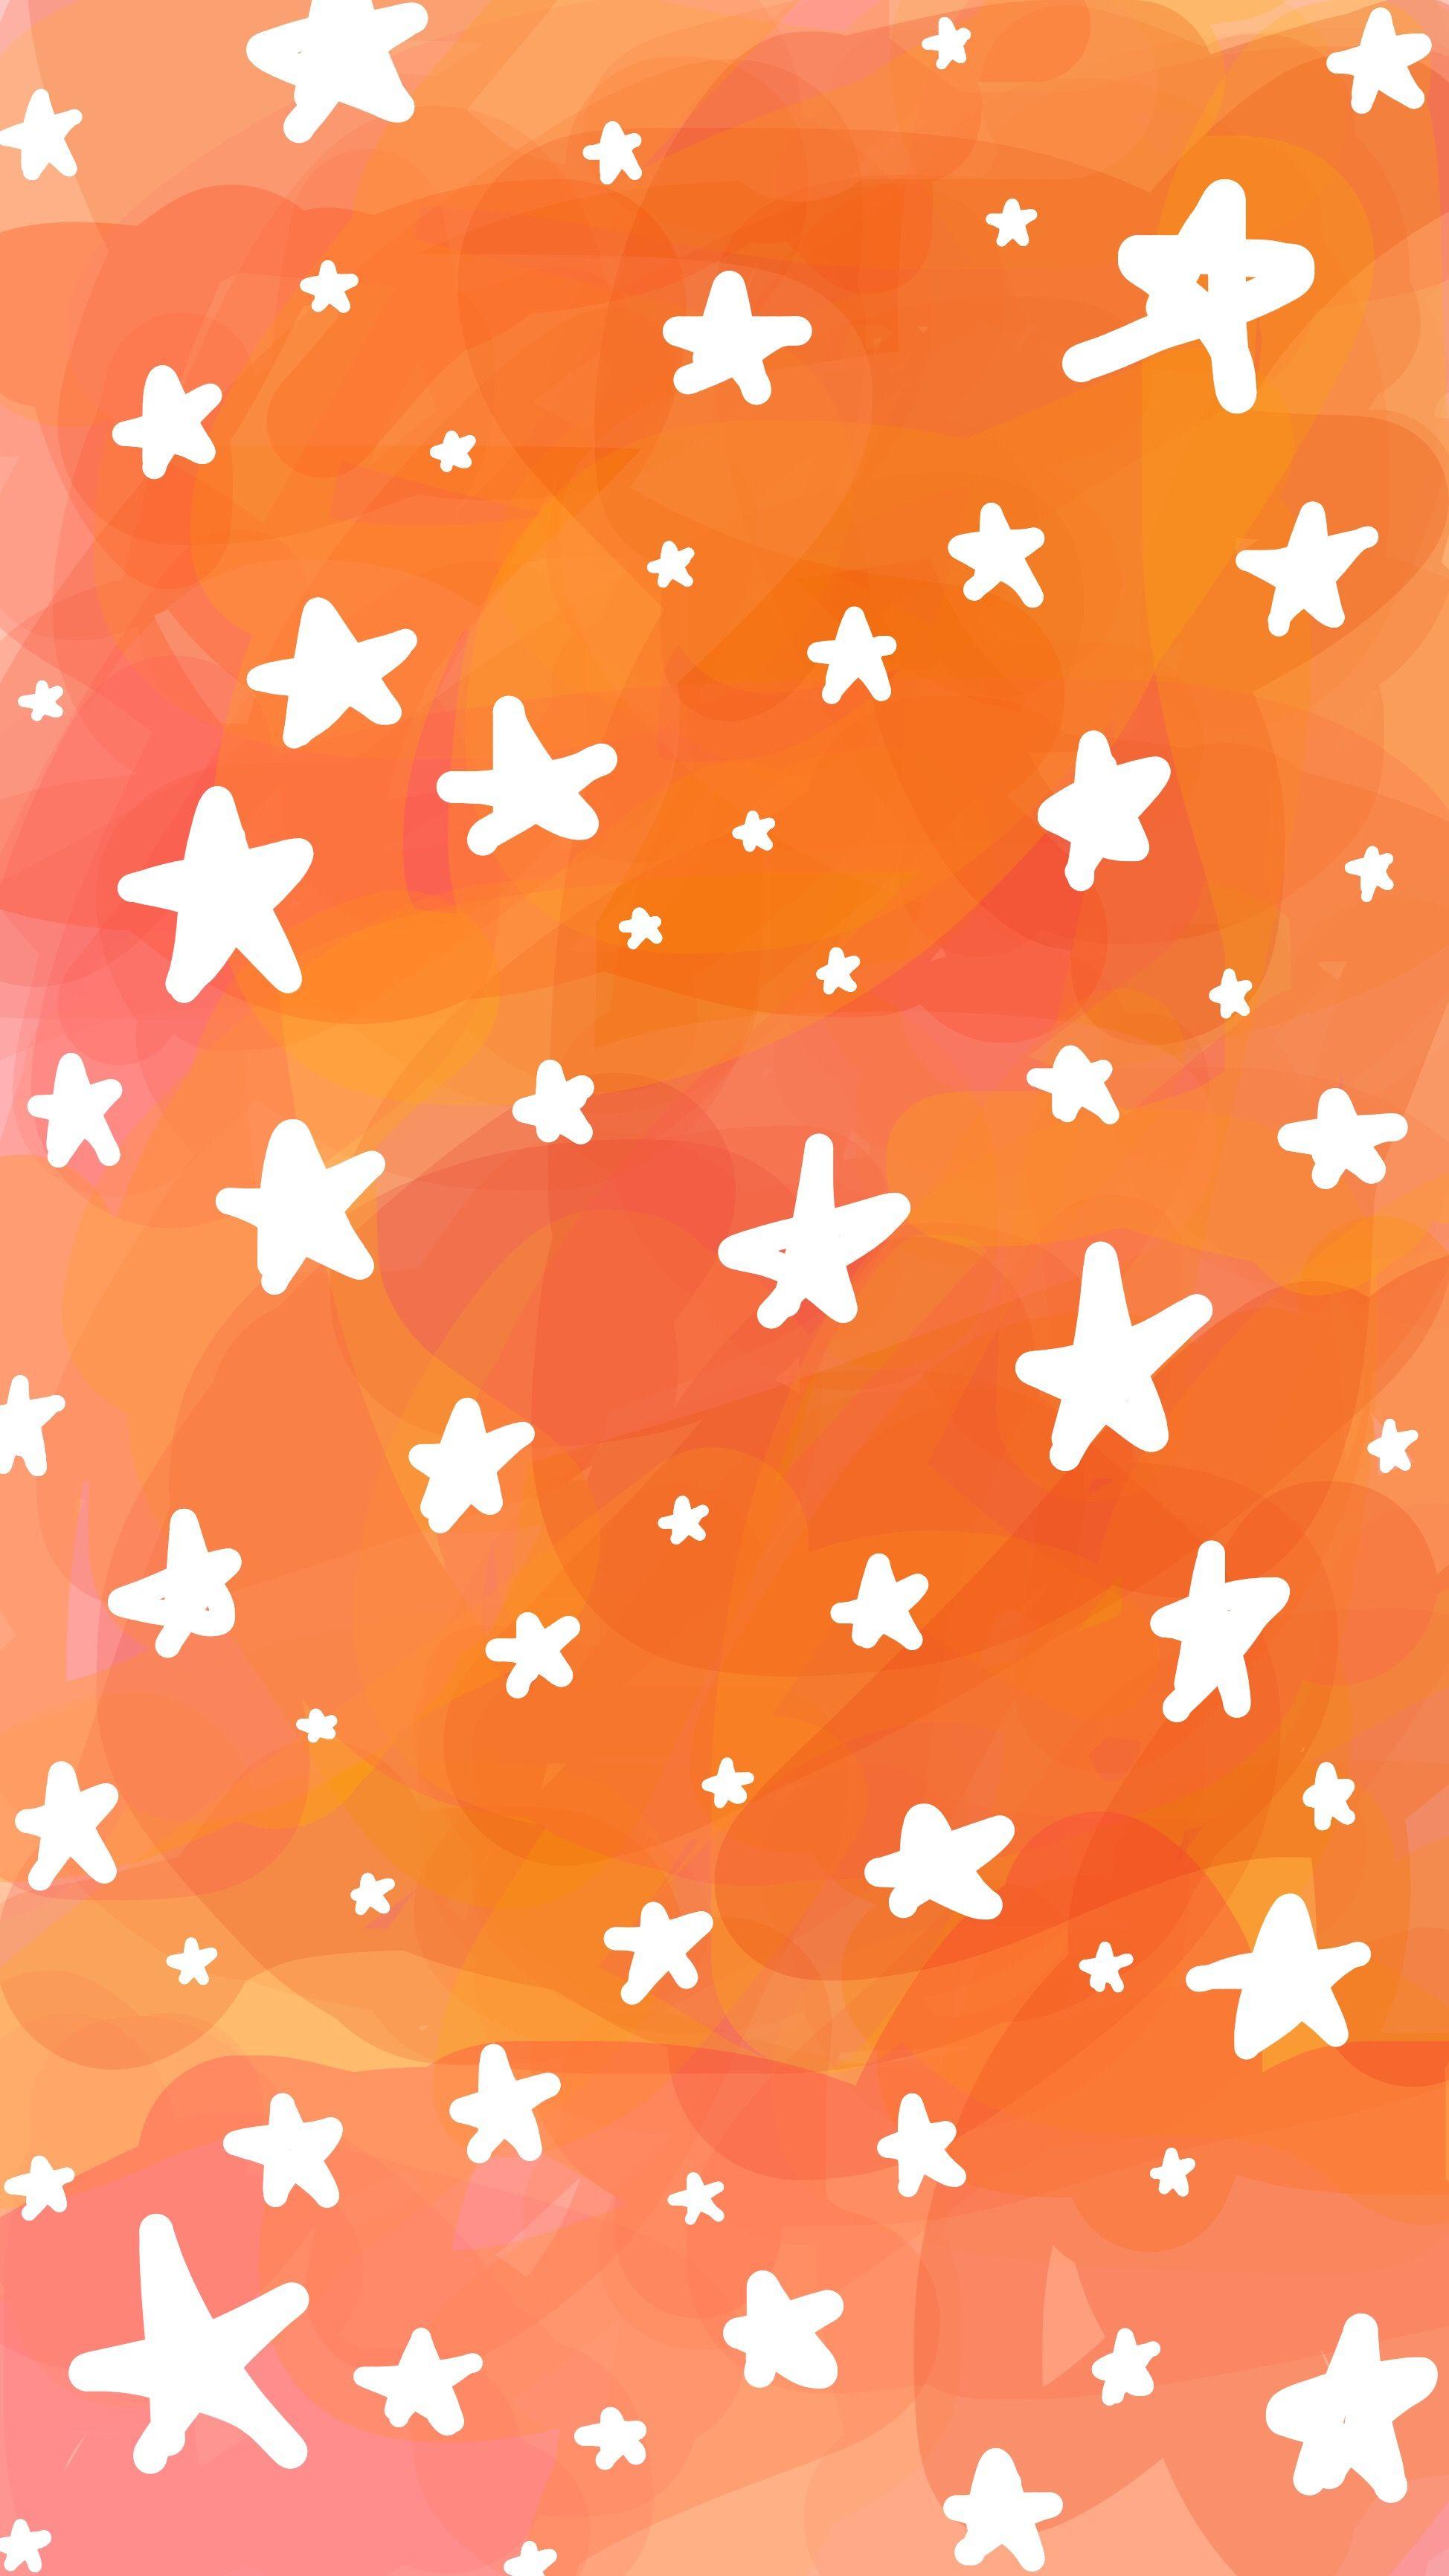 phone lockscreen background pink orange yellow white